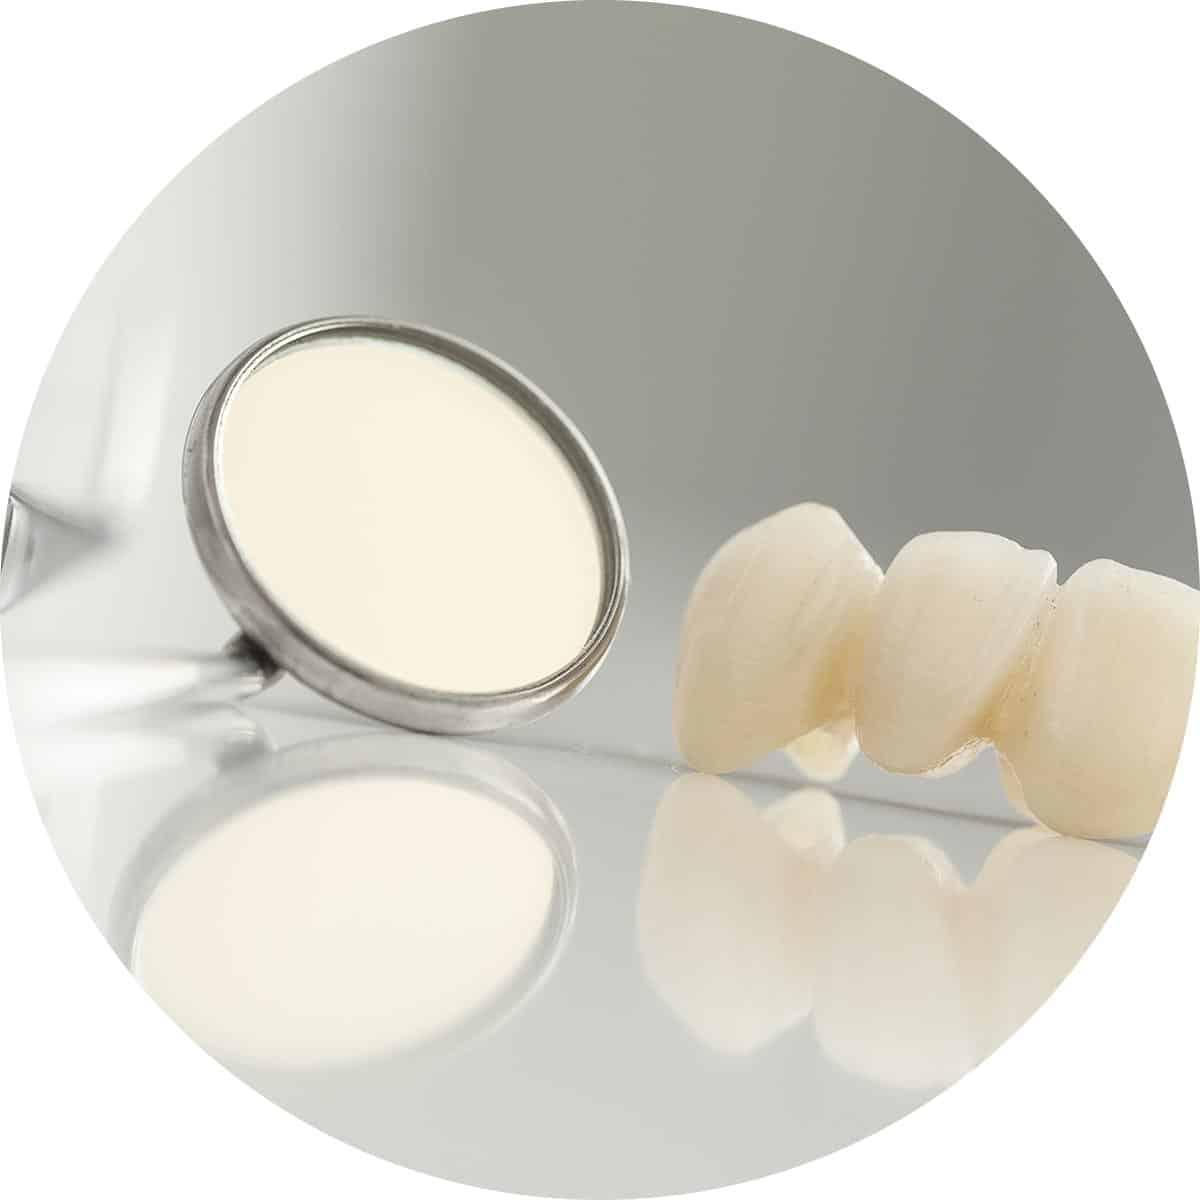 Dental Crowns and Dental mirror image